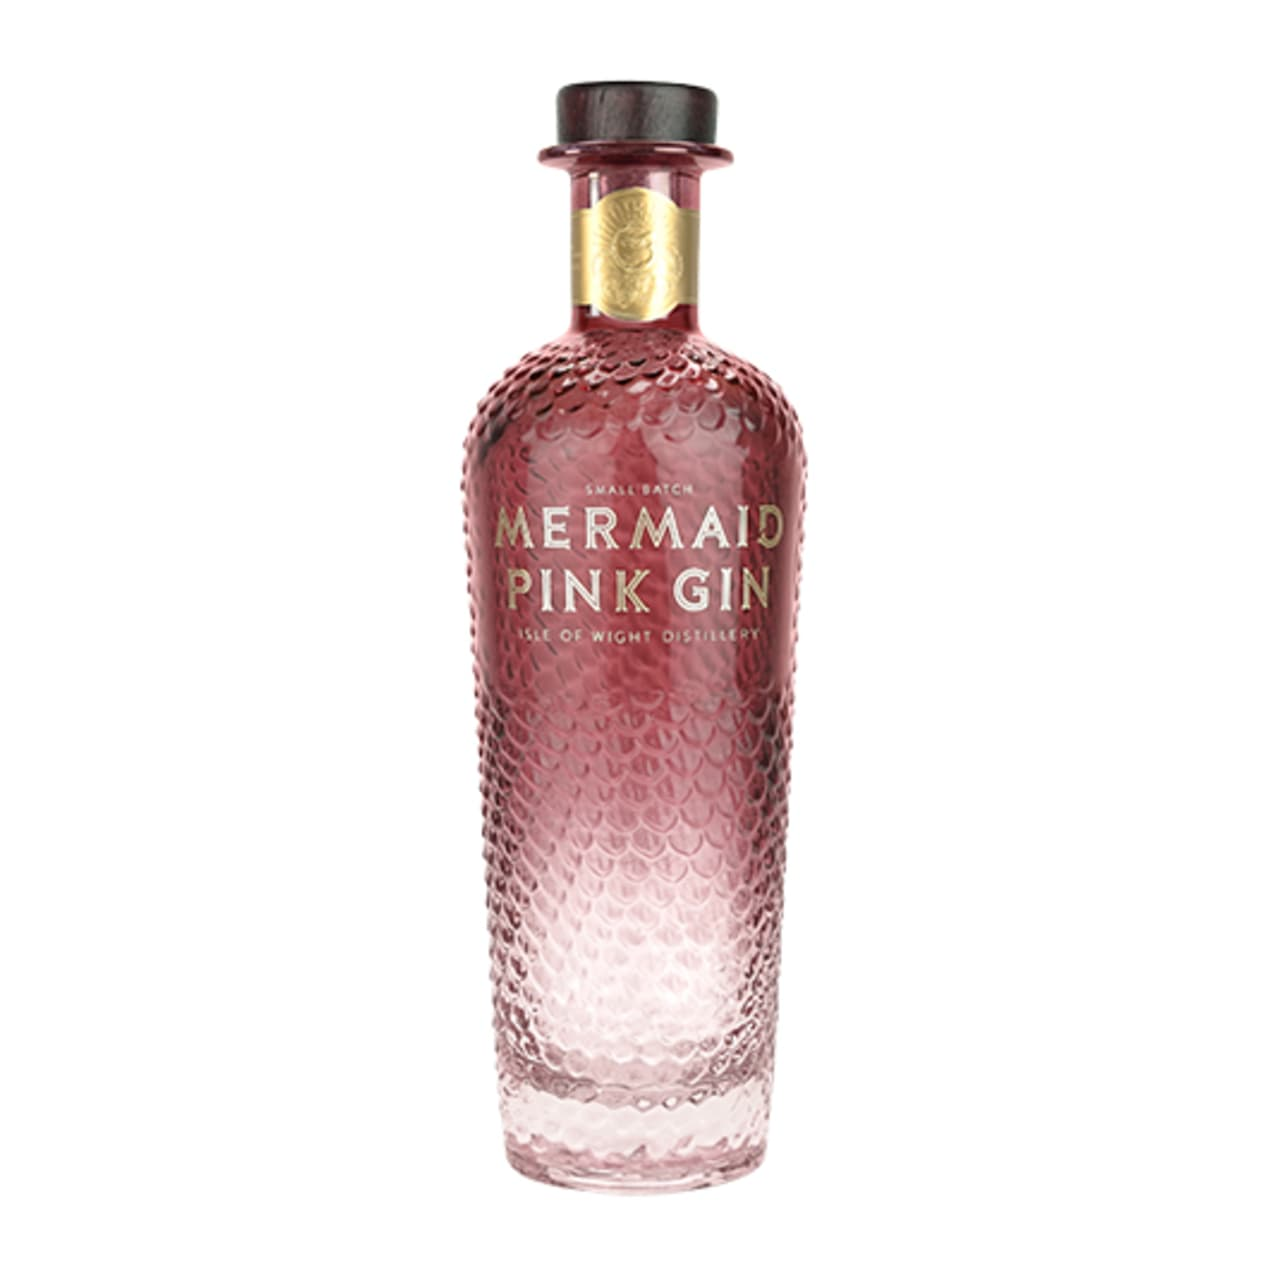 Product Image - Mermaid Pink Gin